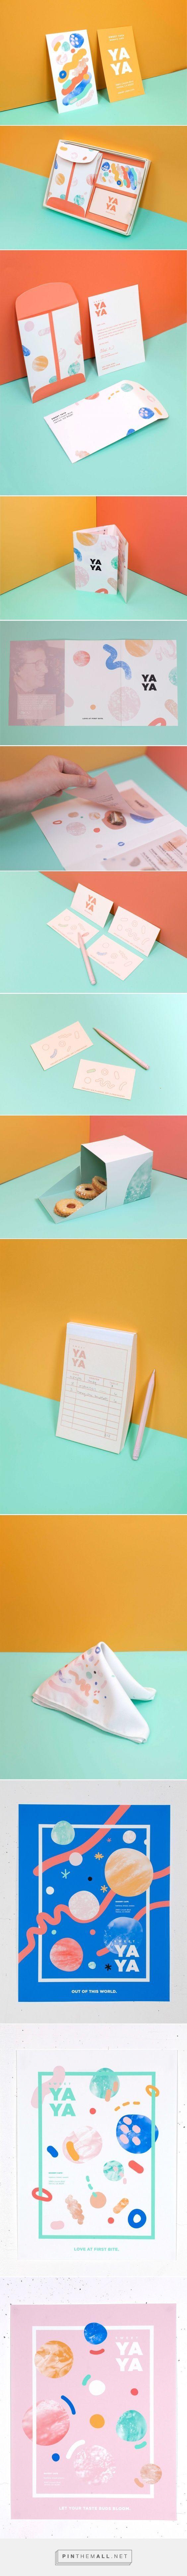 Sweet Yaya Bakery Branding by Sara Haas | Fivestar Branding Agency – Design and Branding Agency & Curated Inspiration Gallery